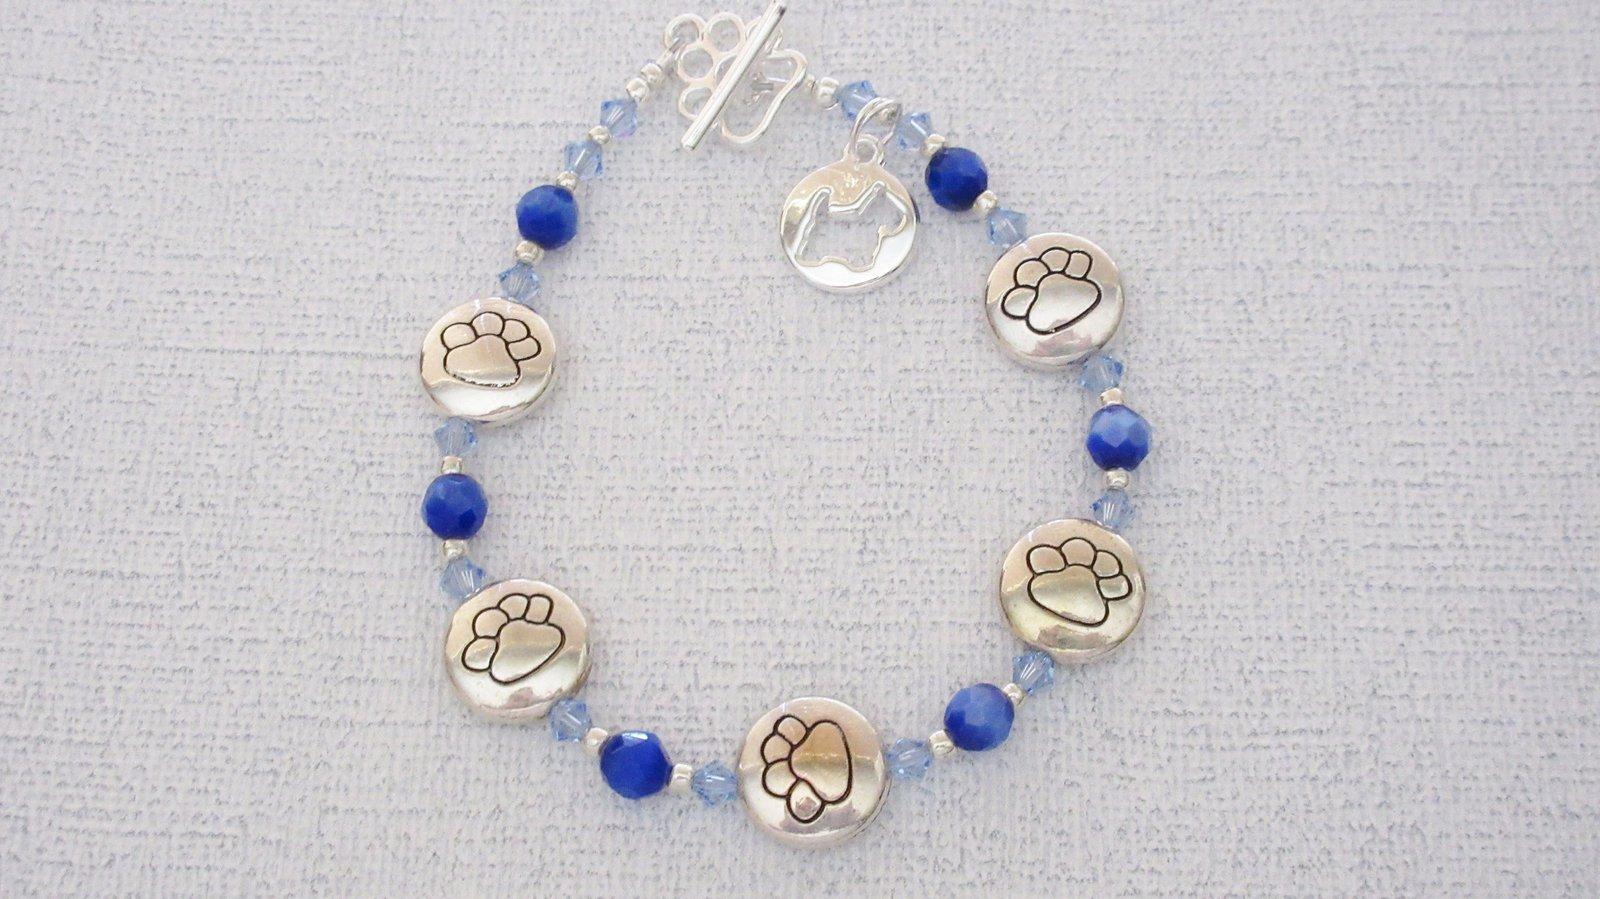 Paw Print Silver Dog Charm Bracelets Sapphire Blue Glass Swarovski Handmade